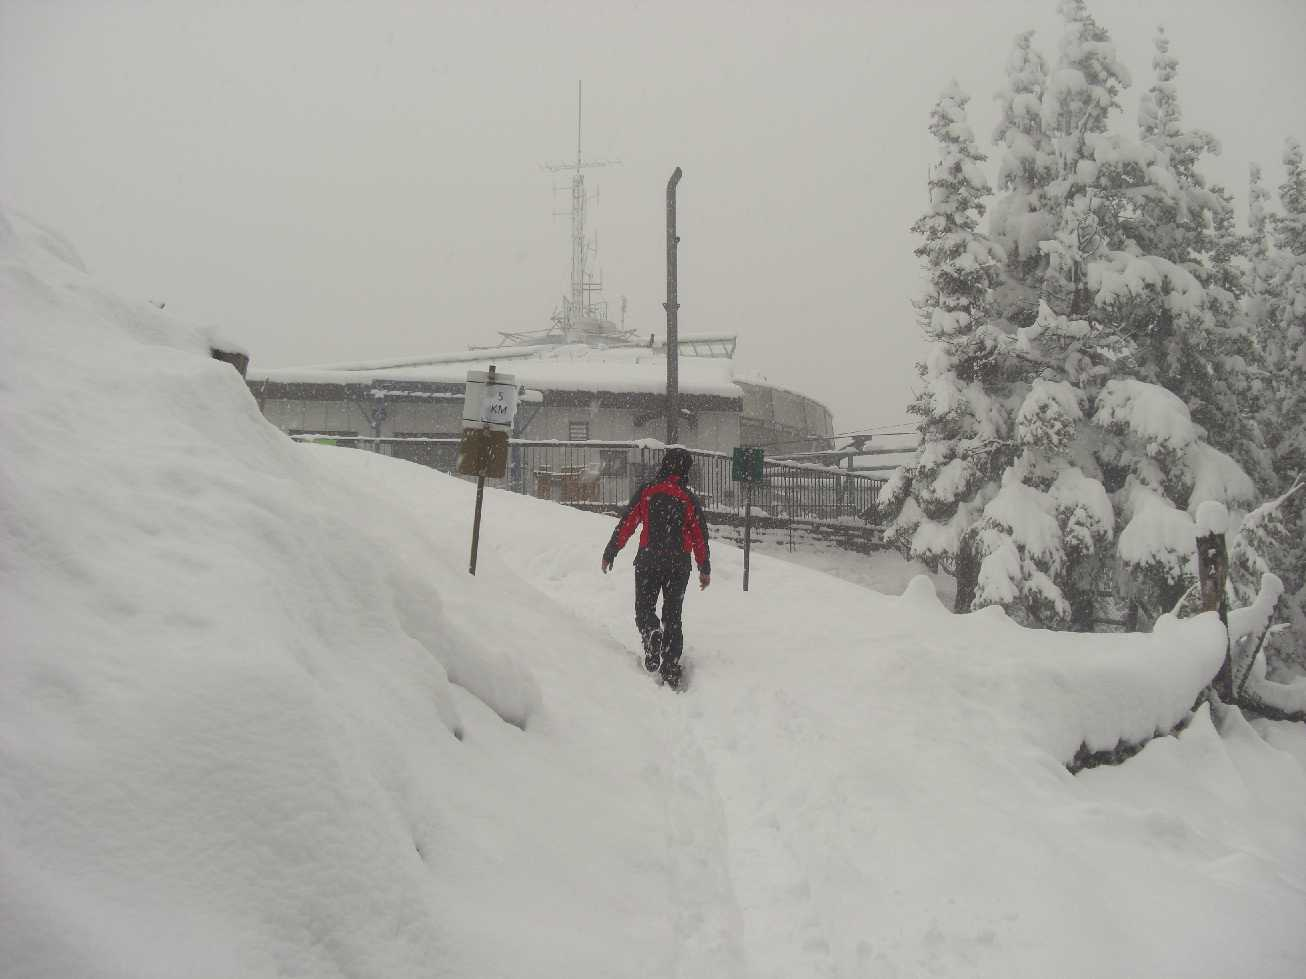 Winter in Banff - Juni 2012